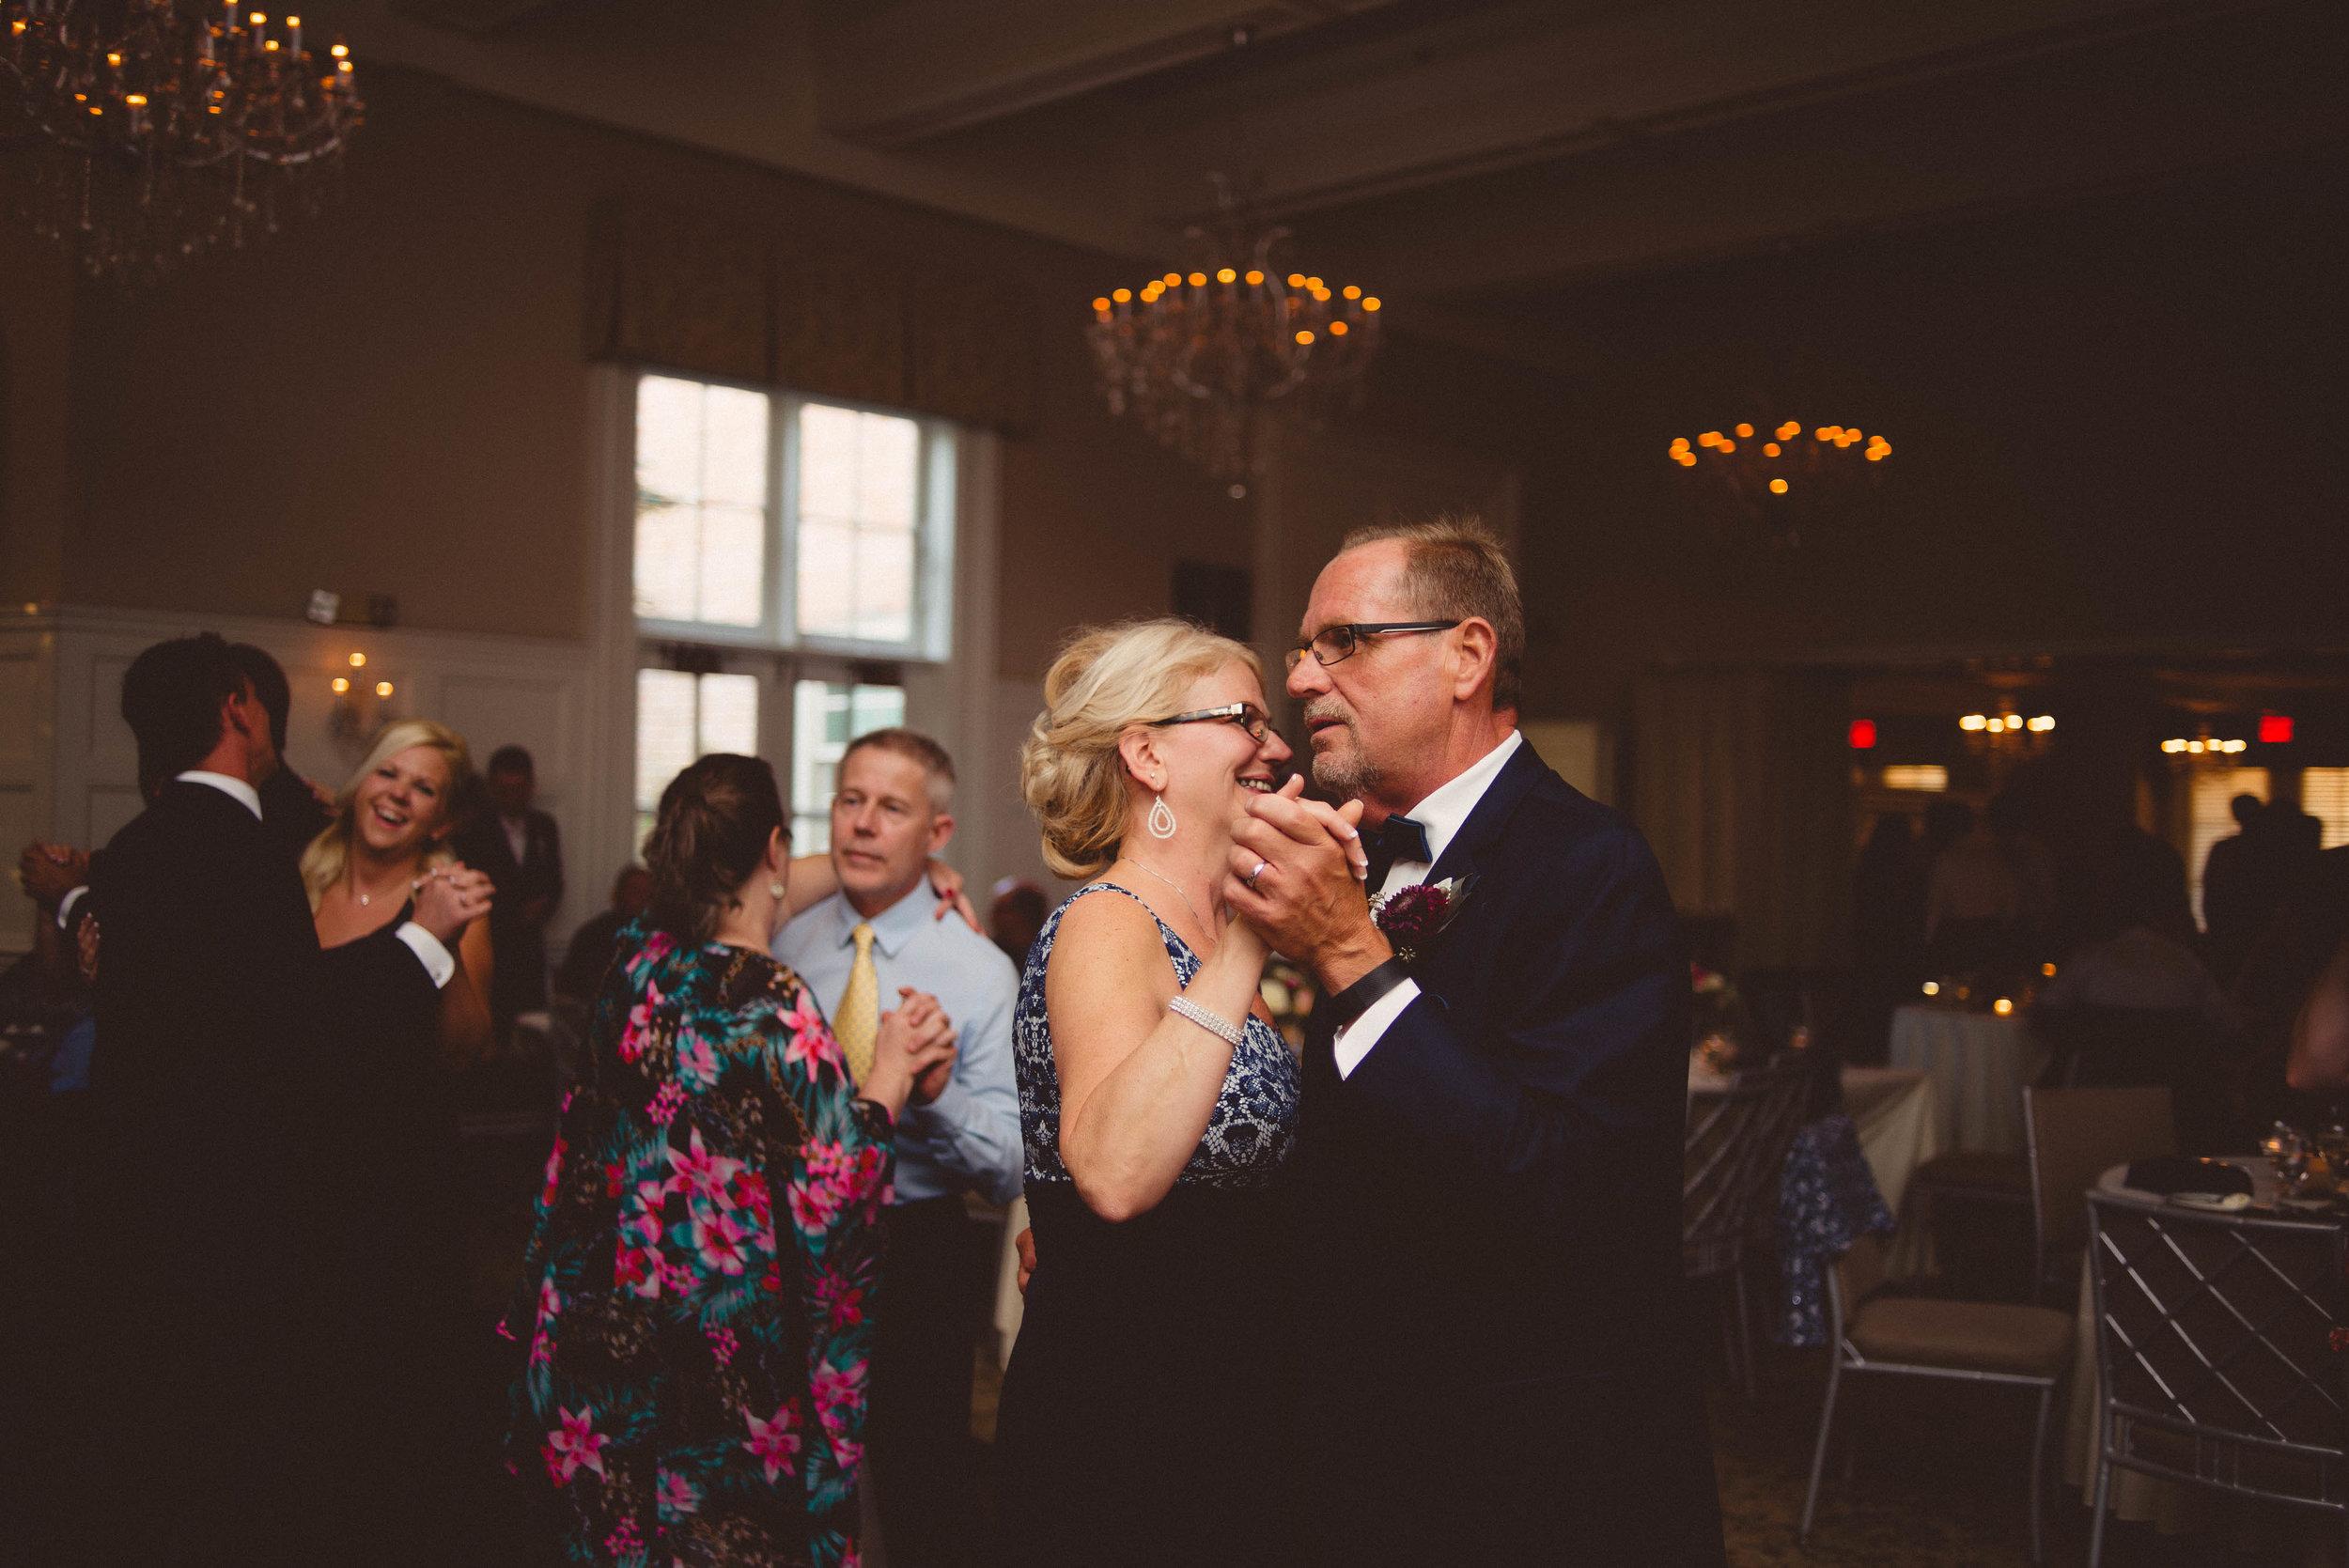 Kara and Mike Wedding-20160904-19-32-05.jpg